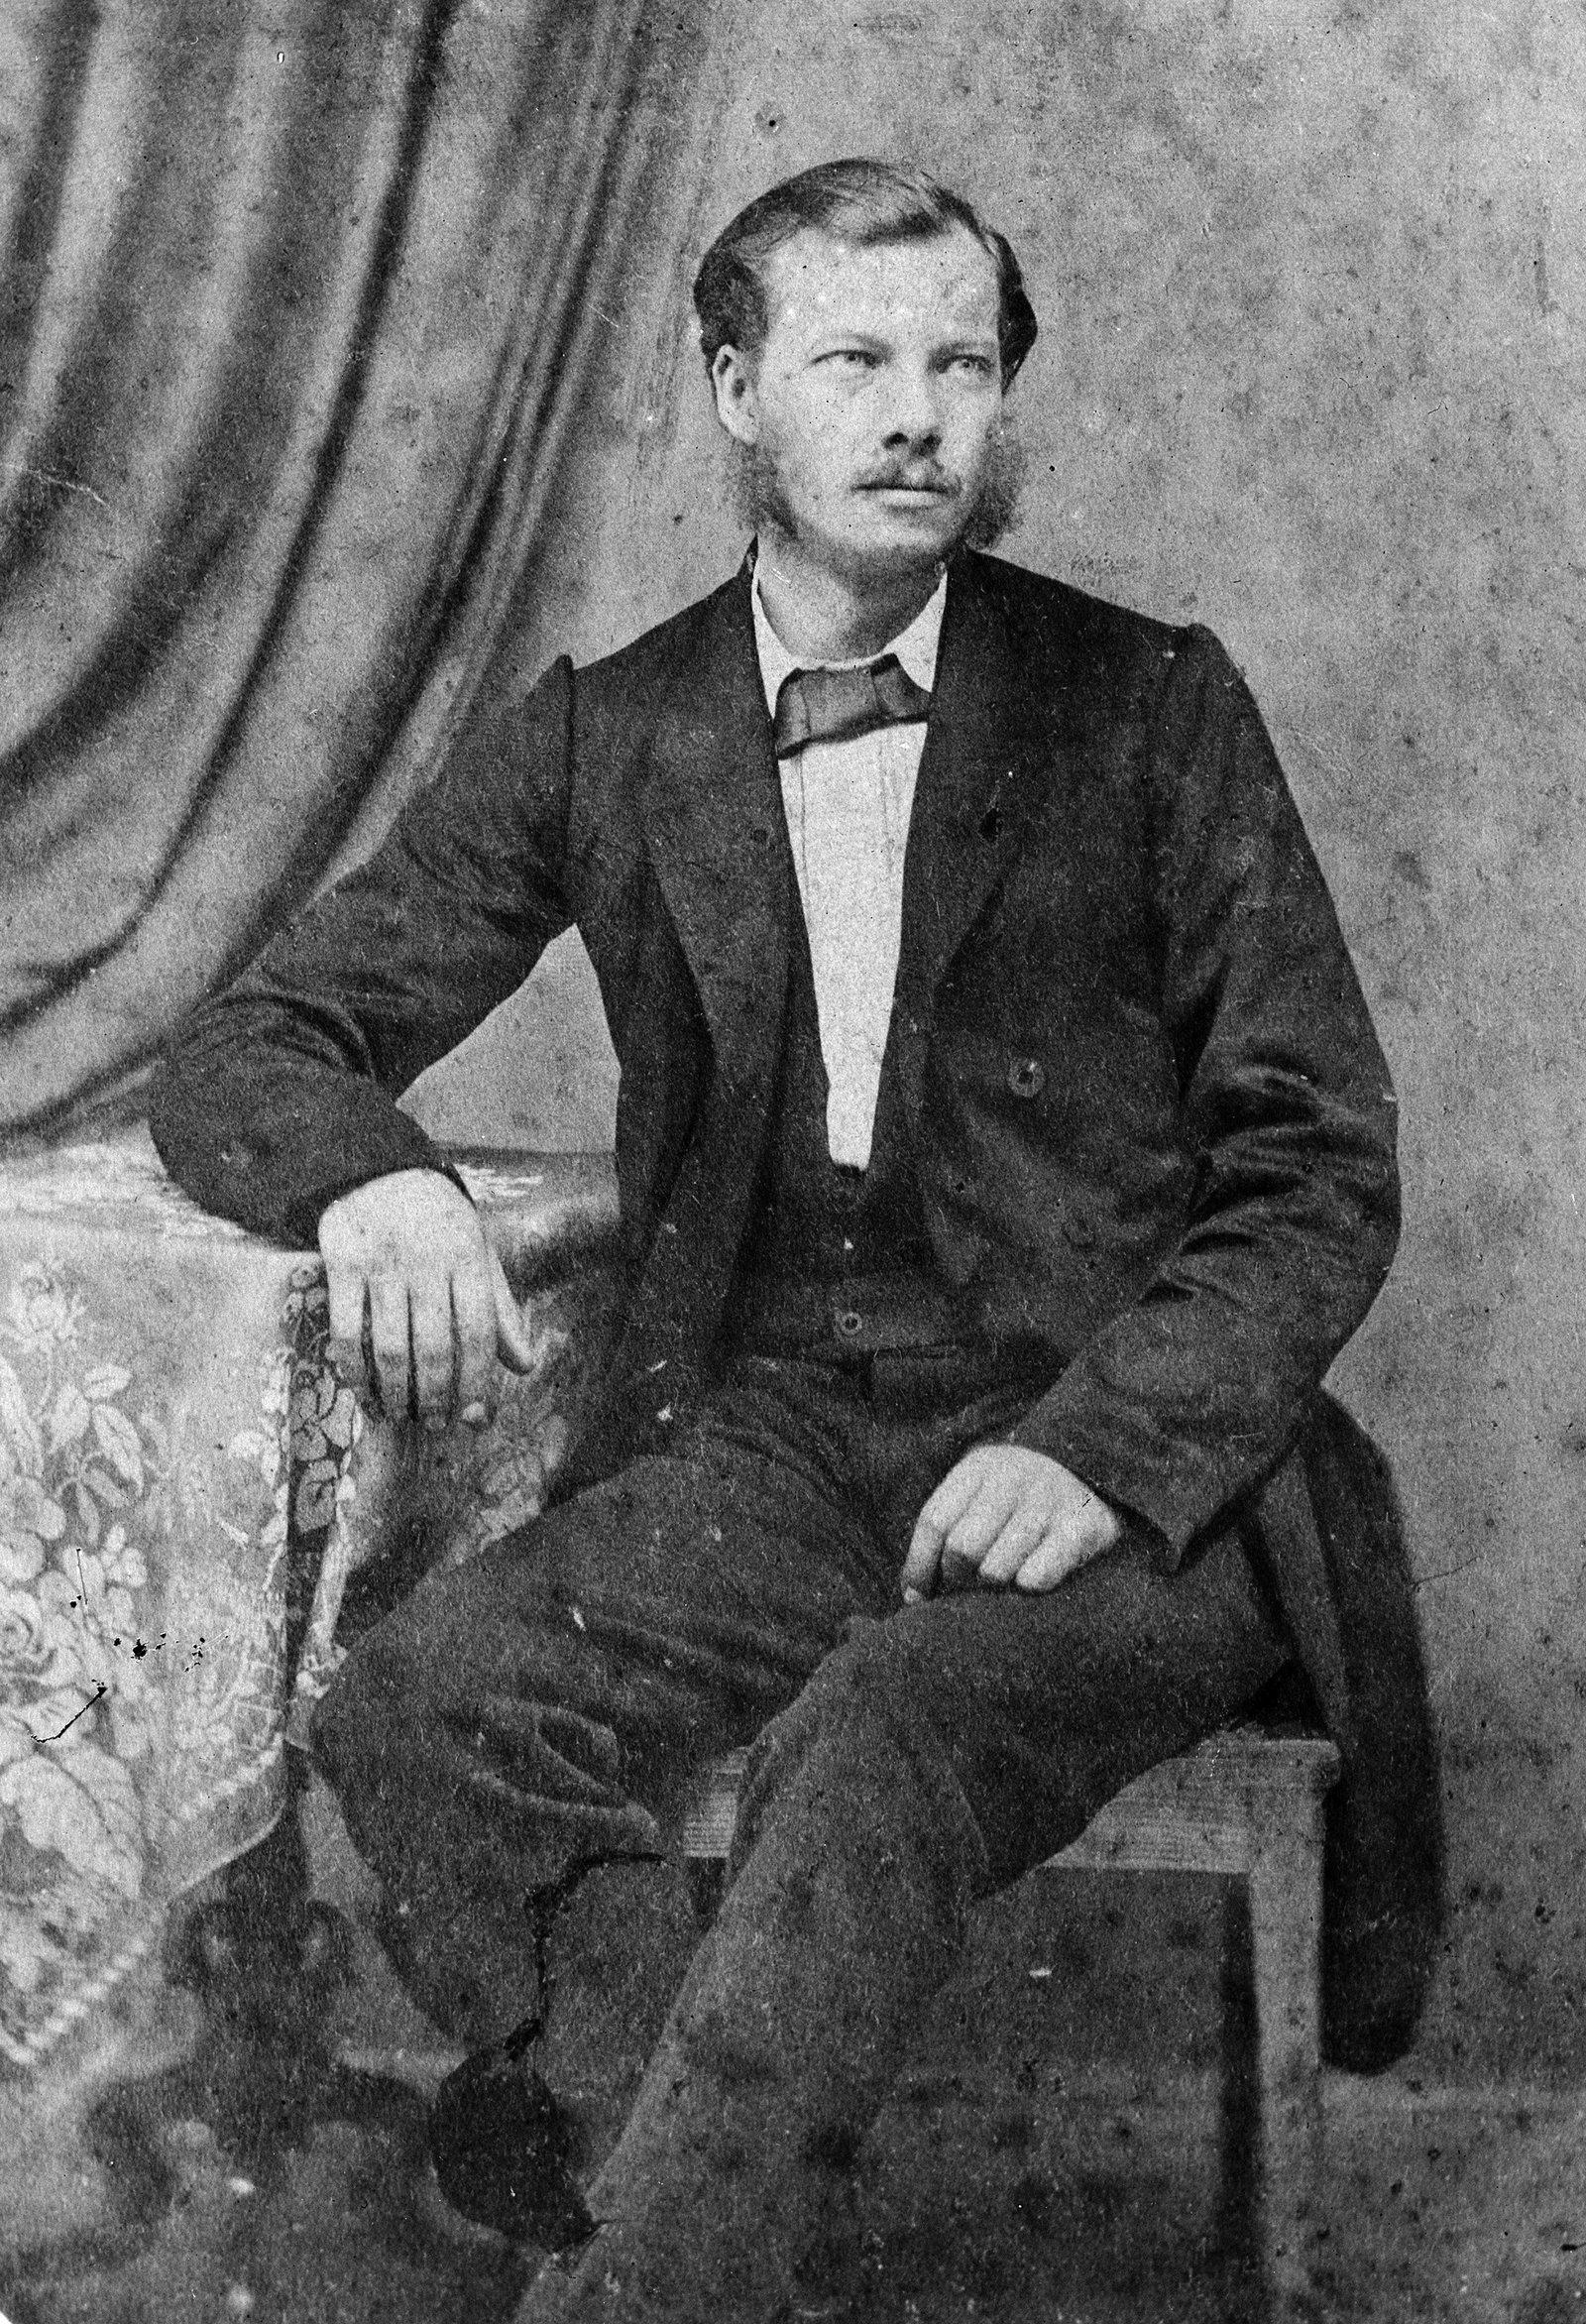 Gerard Krefft